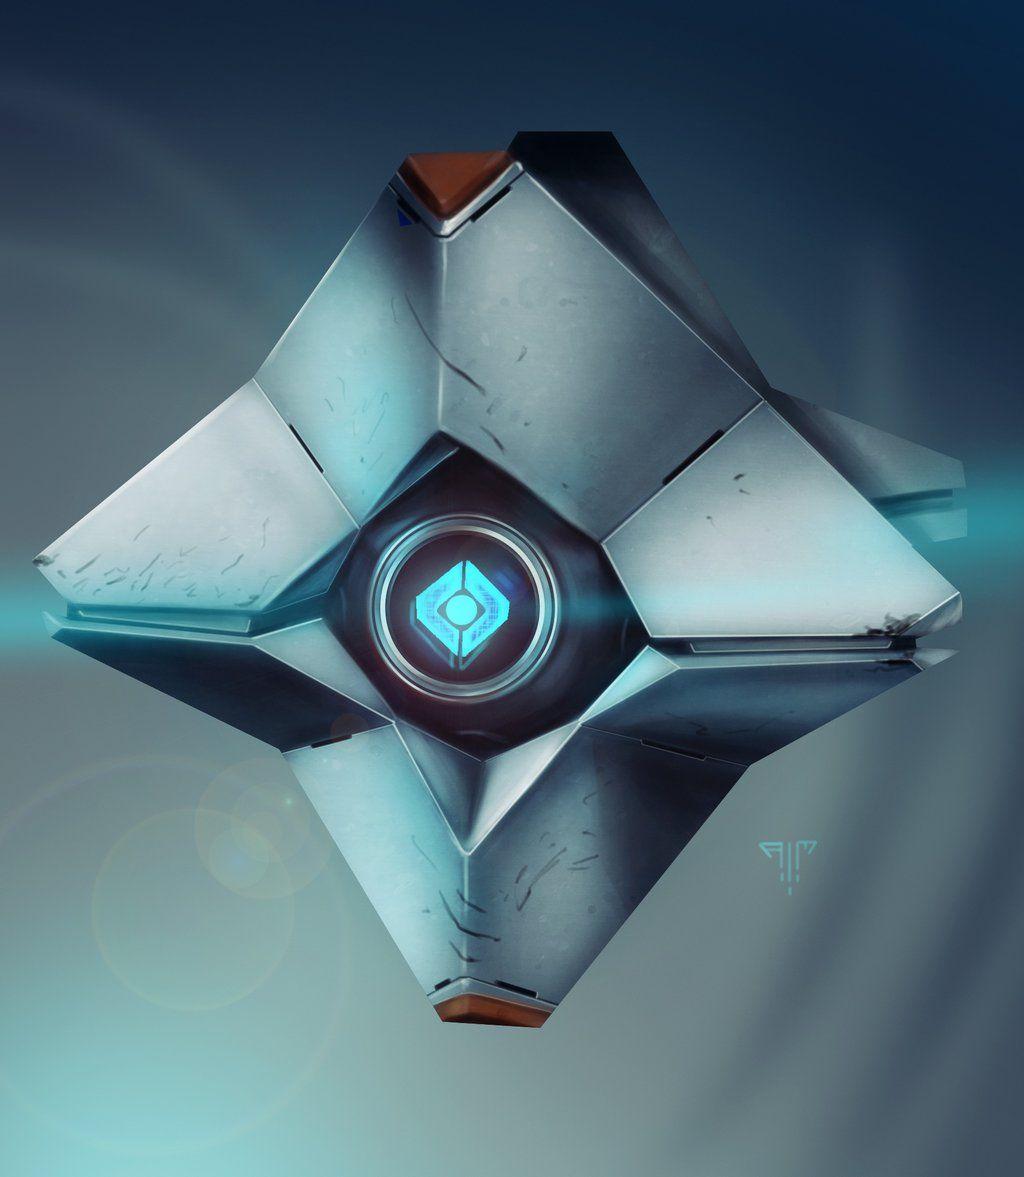 Destiny Desktop Wallpaper: Destiny Ghost Wallpapers